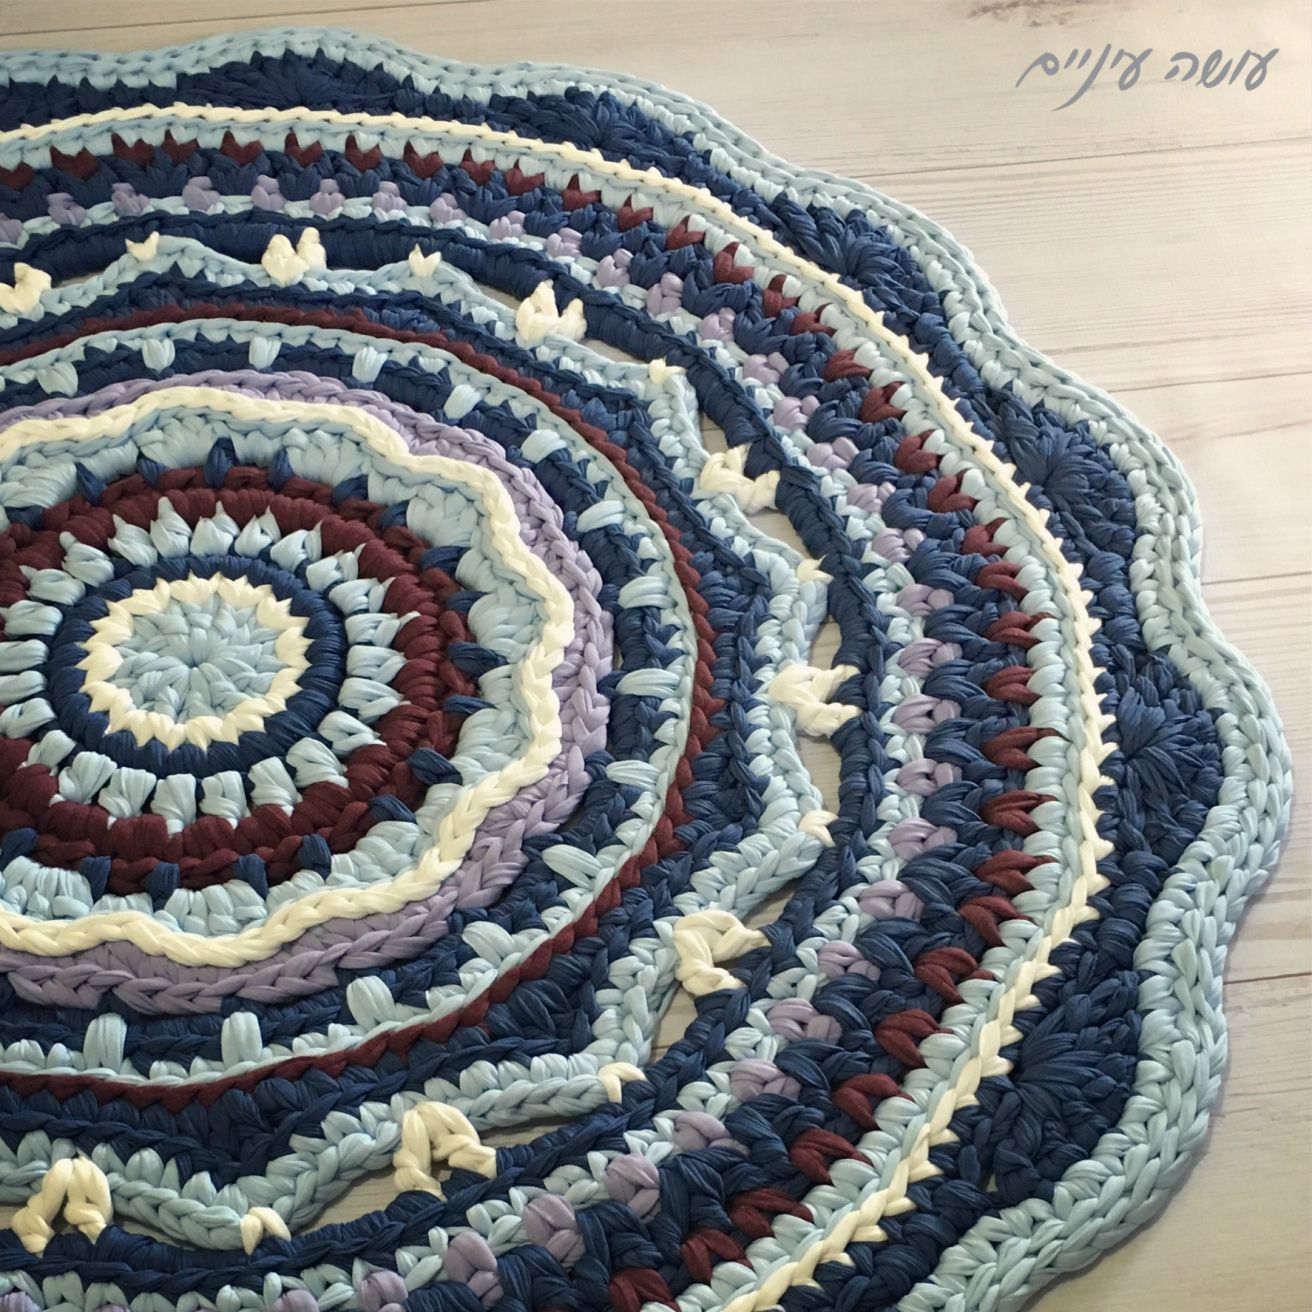 Fazendo olho - carpet Mandala T-malha ||  Osa Einaim - t-shirt de fios trapillo crohet mandala tapete